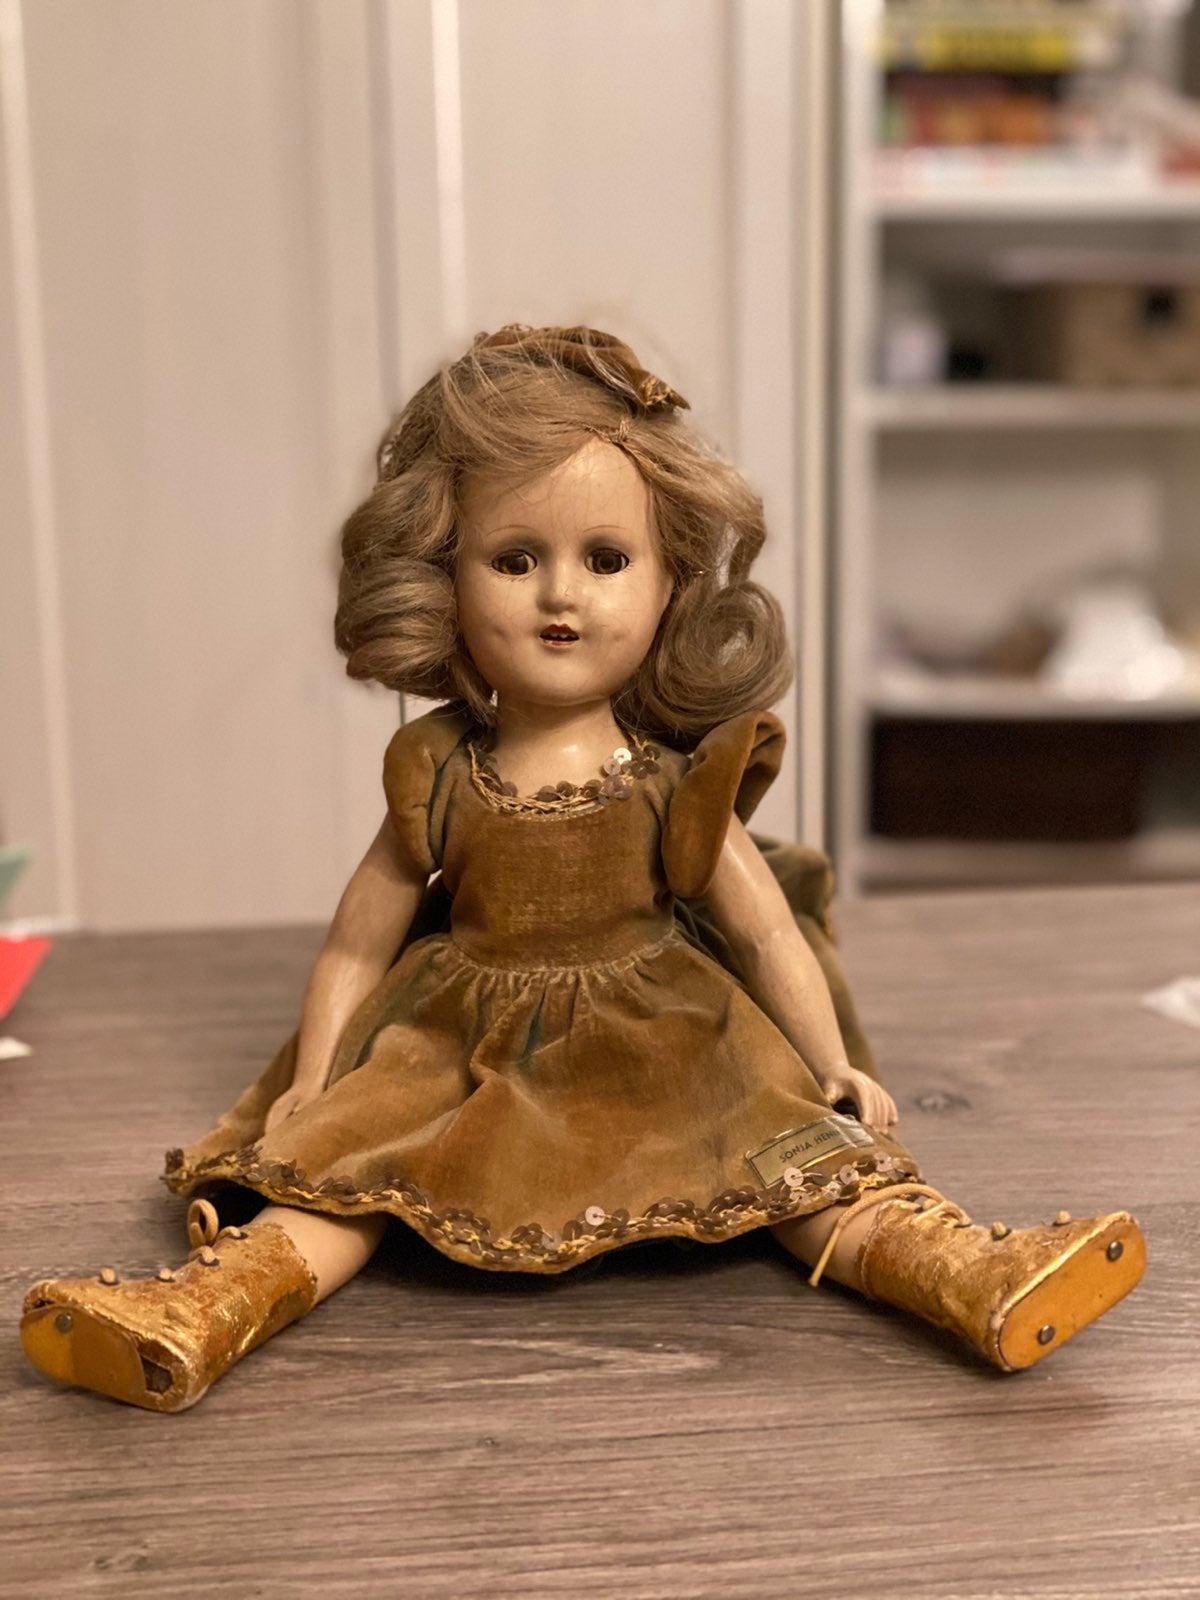 Vintage Composition Sonja Henie doll